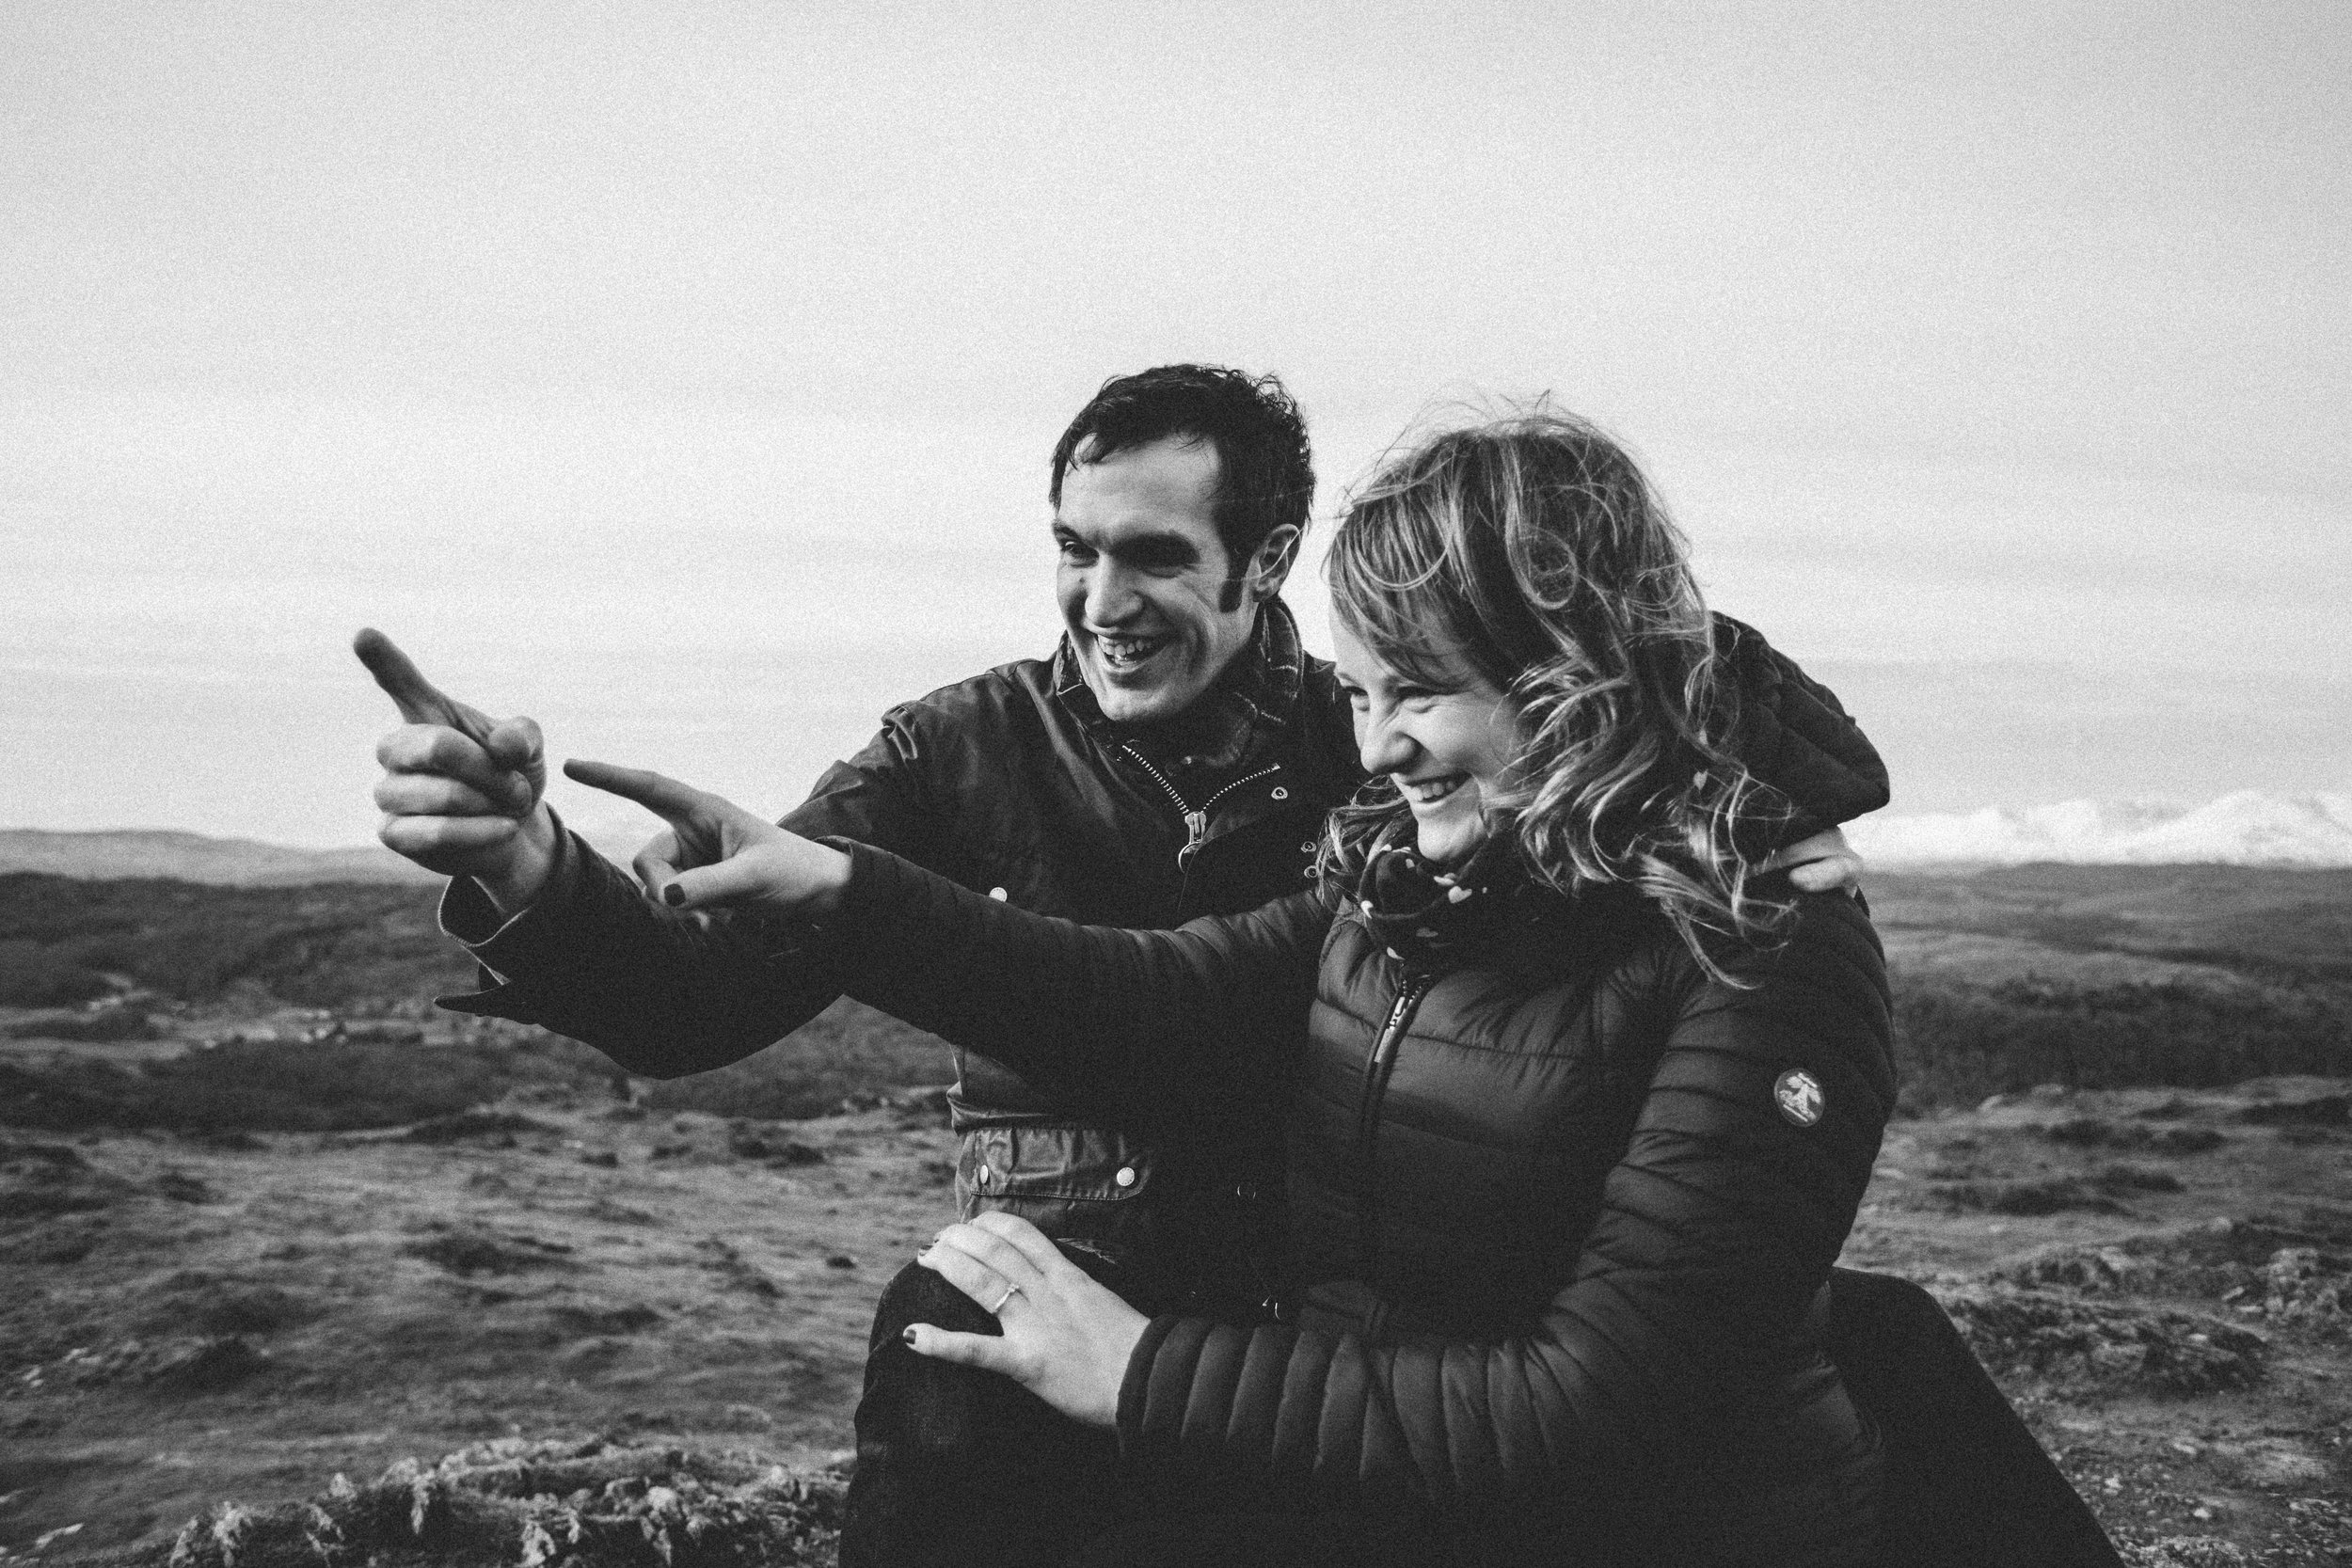 Alex + Matt - Windermere Engagement Photography - Claire Basiuk - 25.jpg